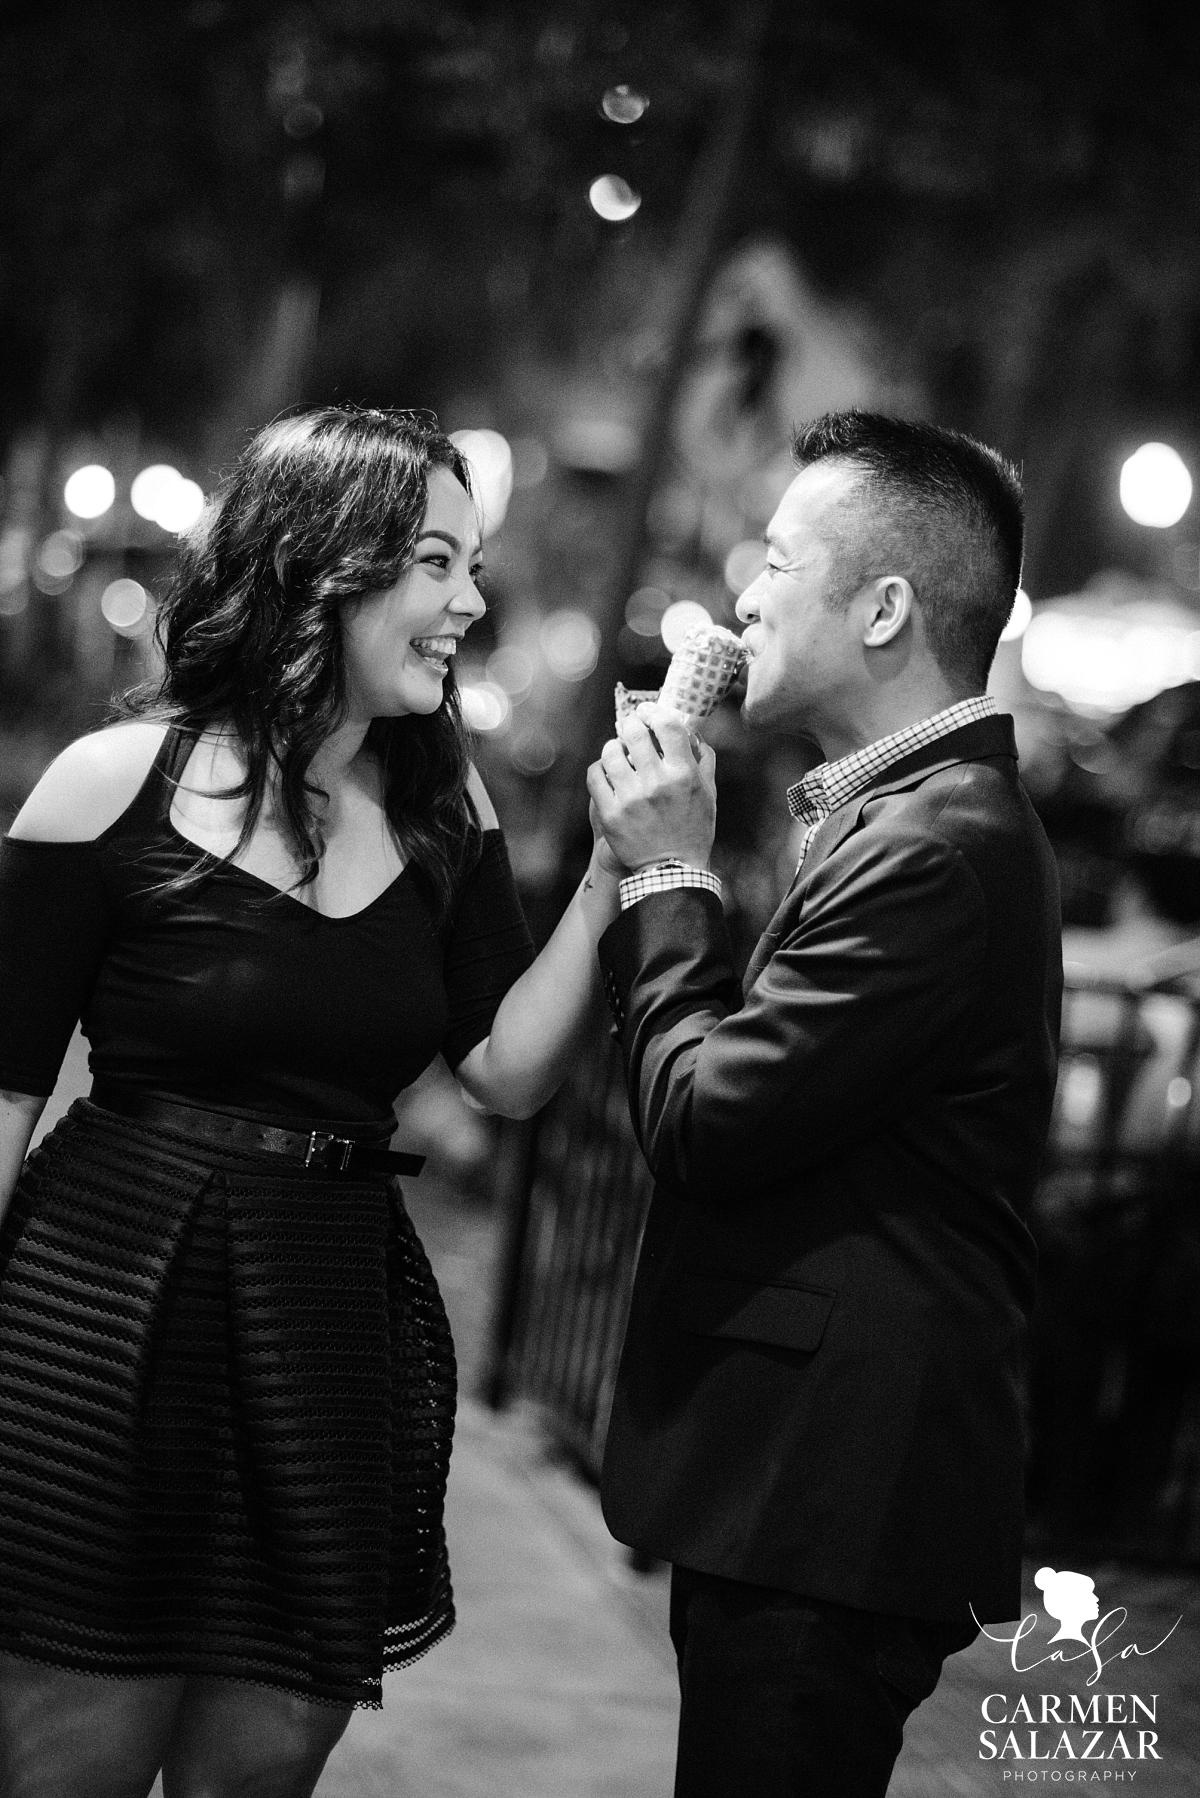 Fun and playful engagement photography ideas - Carmen Salazar